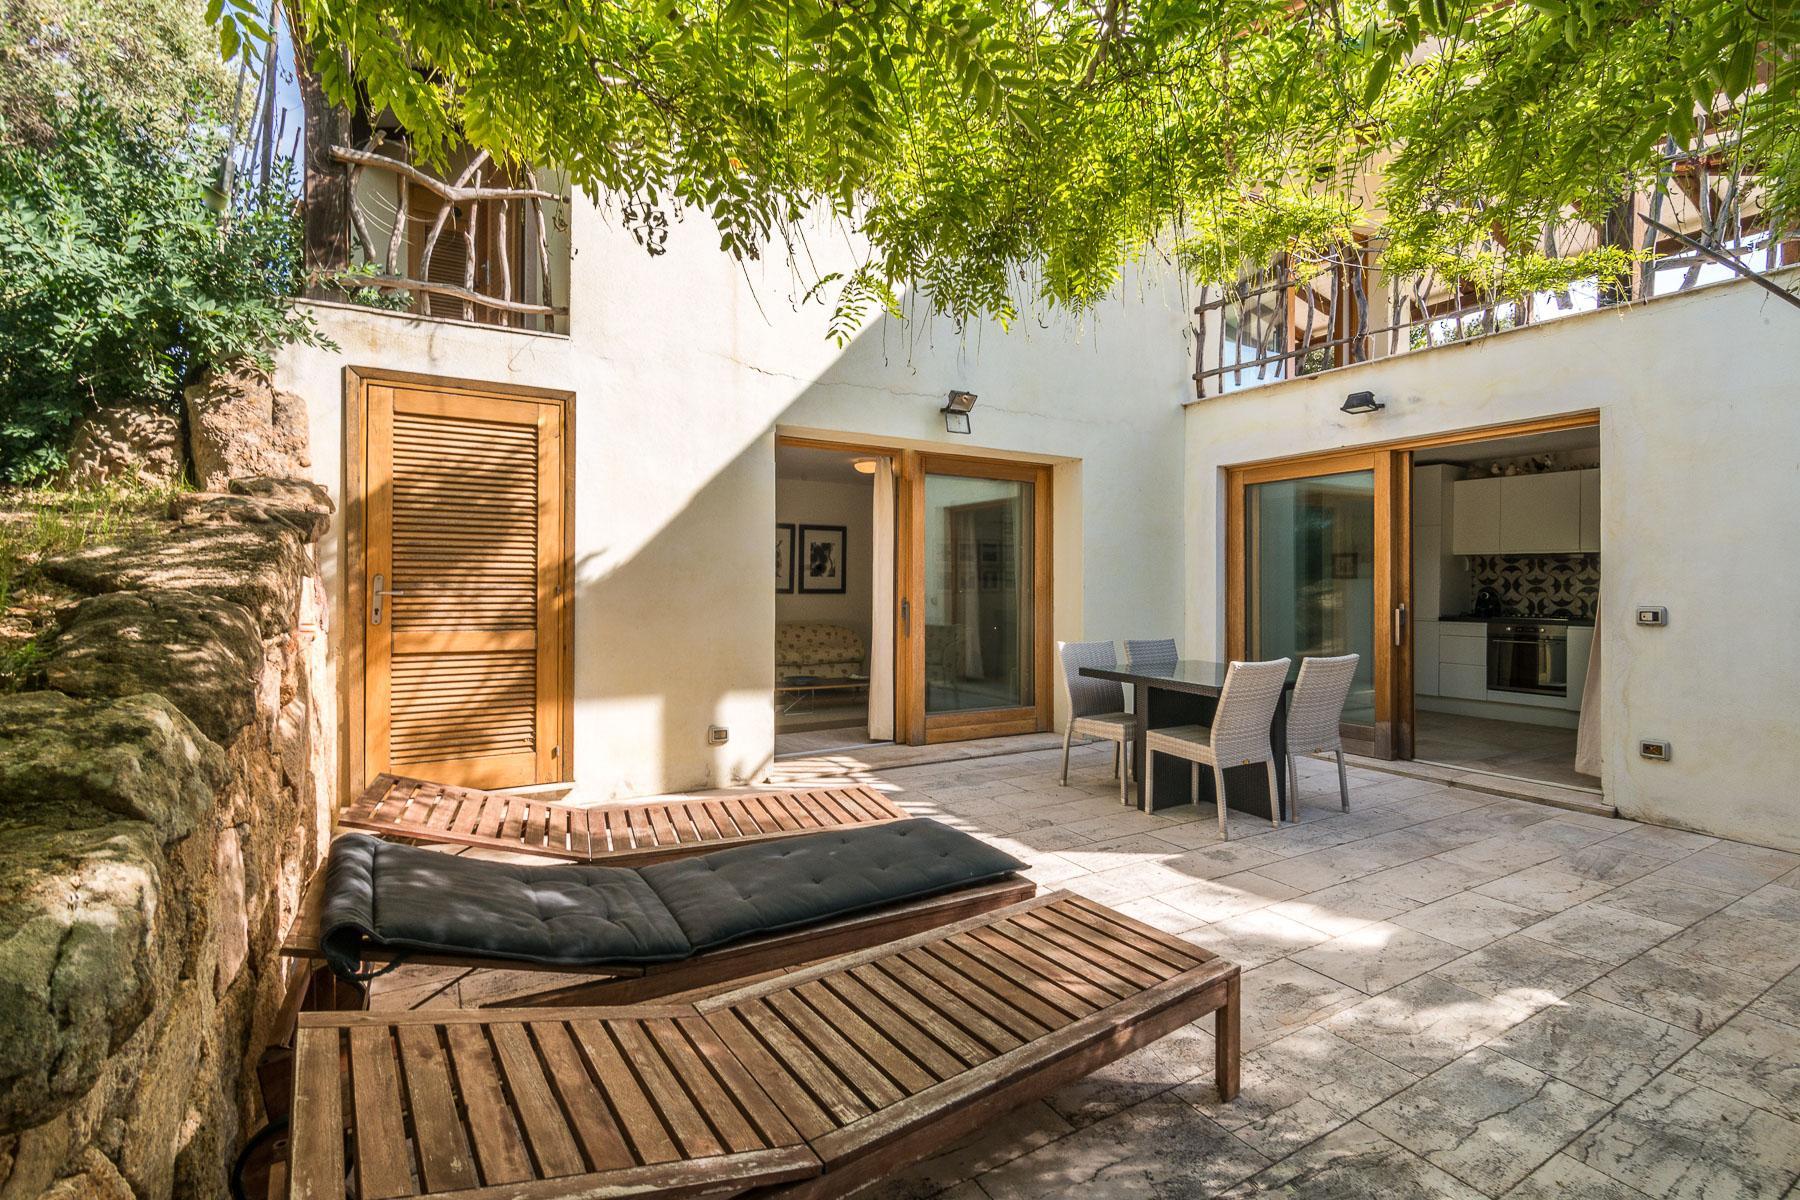 Golfo Aranci Sos Aranzos Wonderfull Villa with direct access to the beach - 19